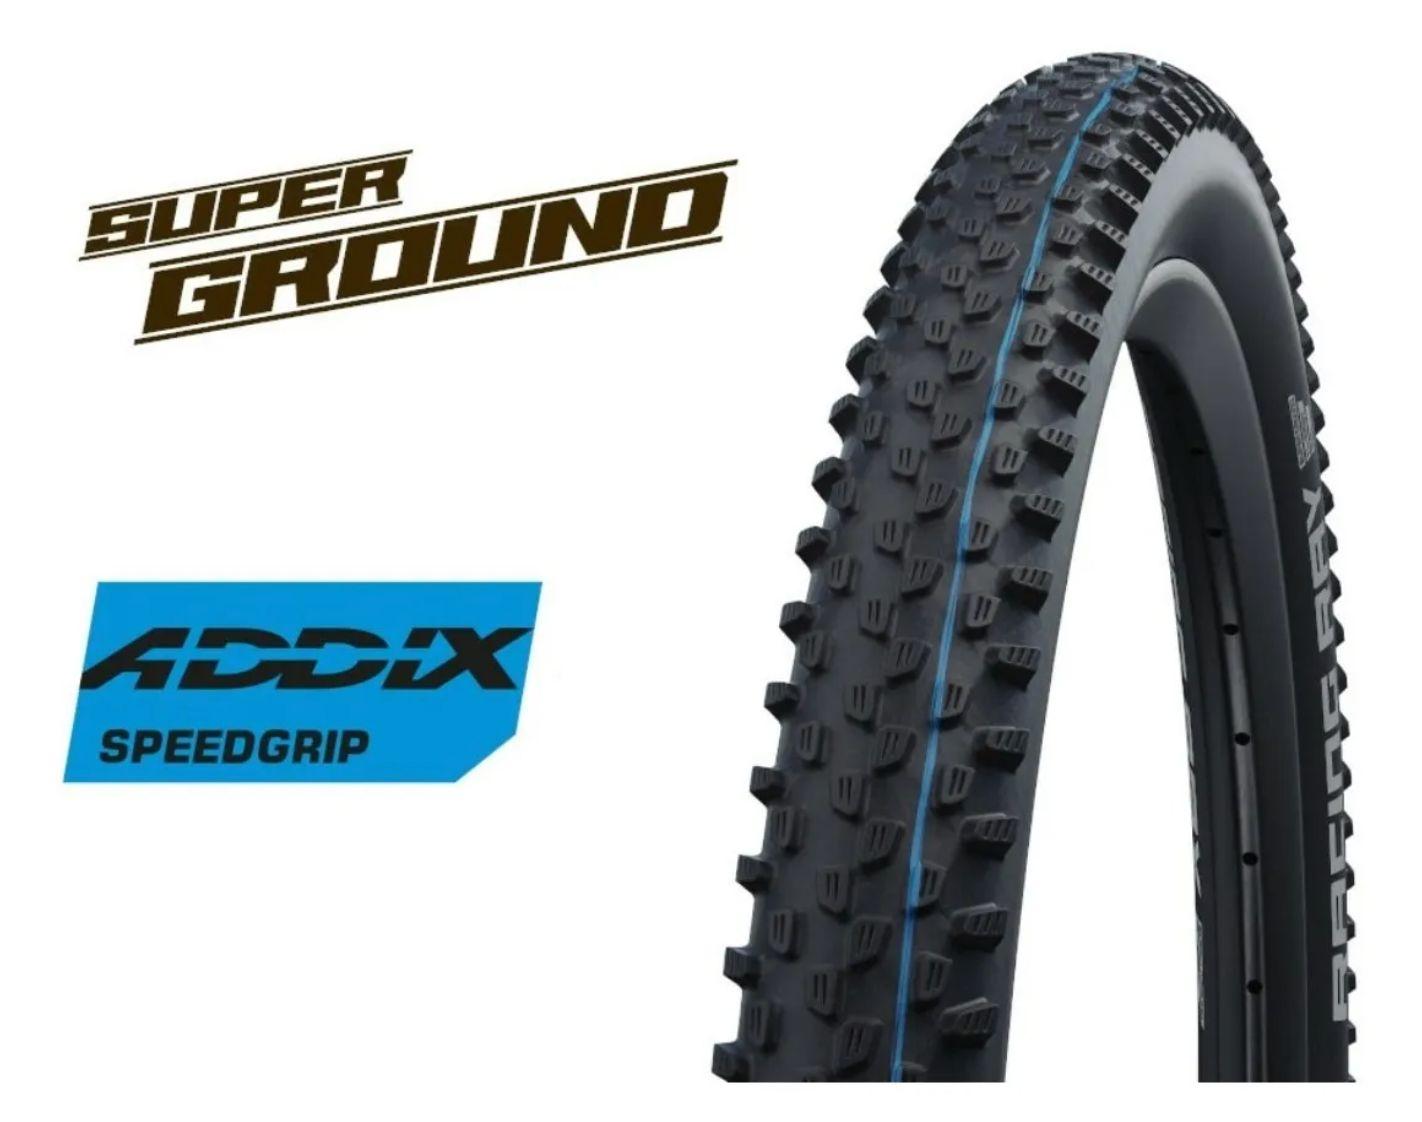 Pneu Schwalbe Racing Ray Superground Snakeskin Addix 29x2.35